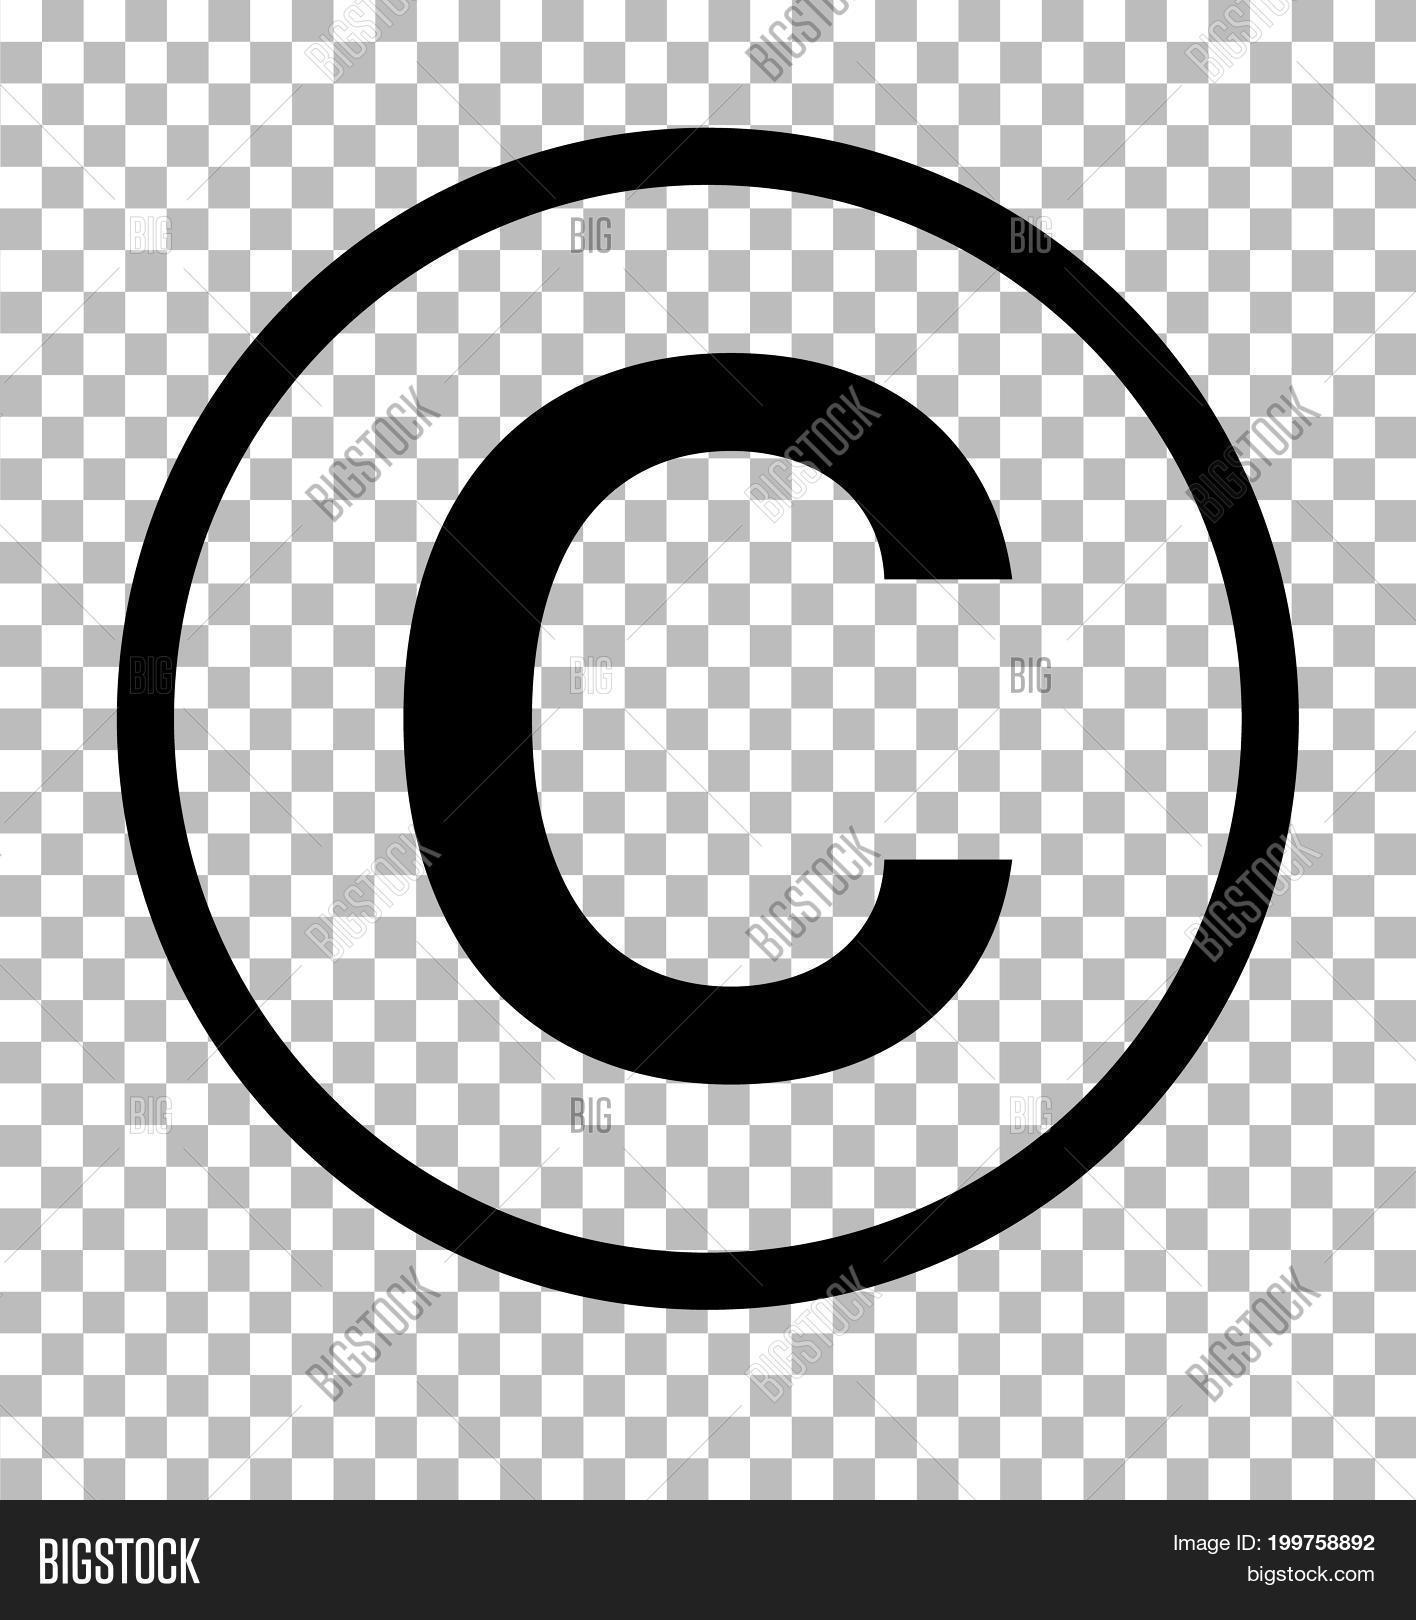 Registered Trademark Symbol Size